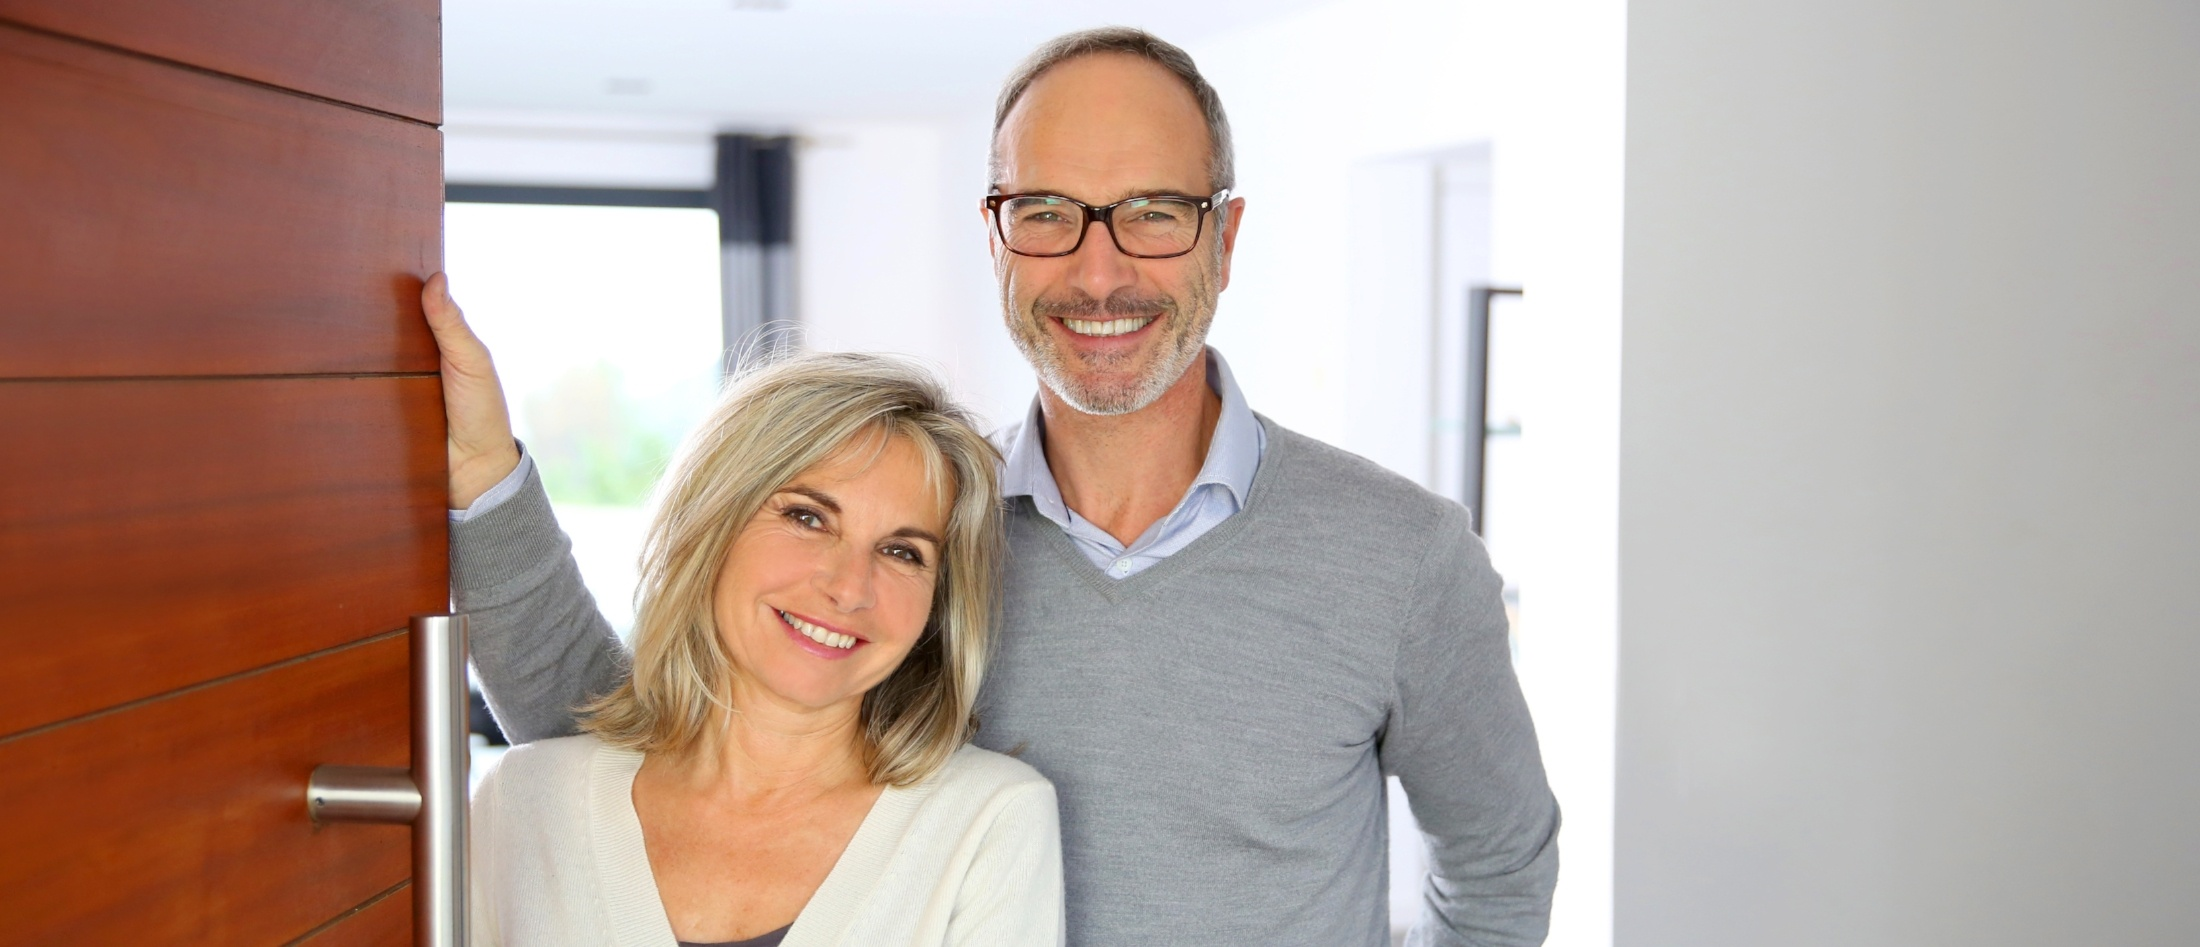 jumbo-non-prime-hero-older-couple-705417-edited.jpeg